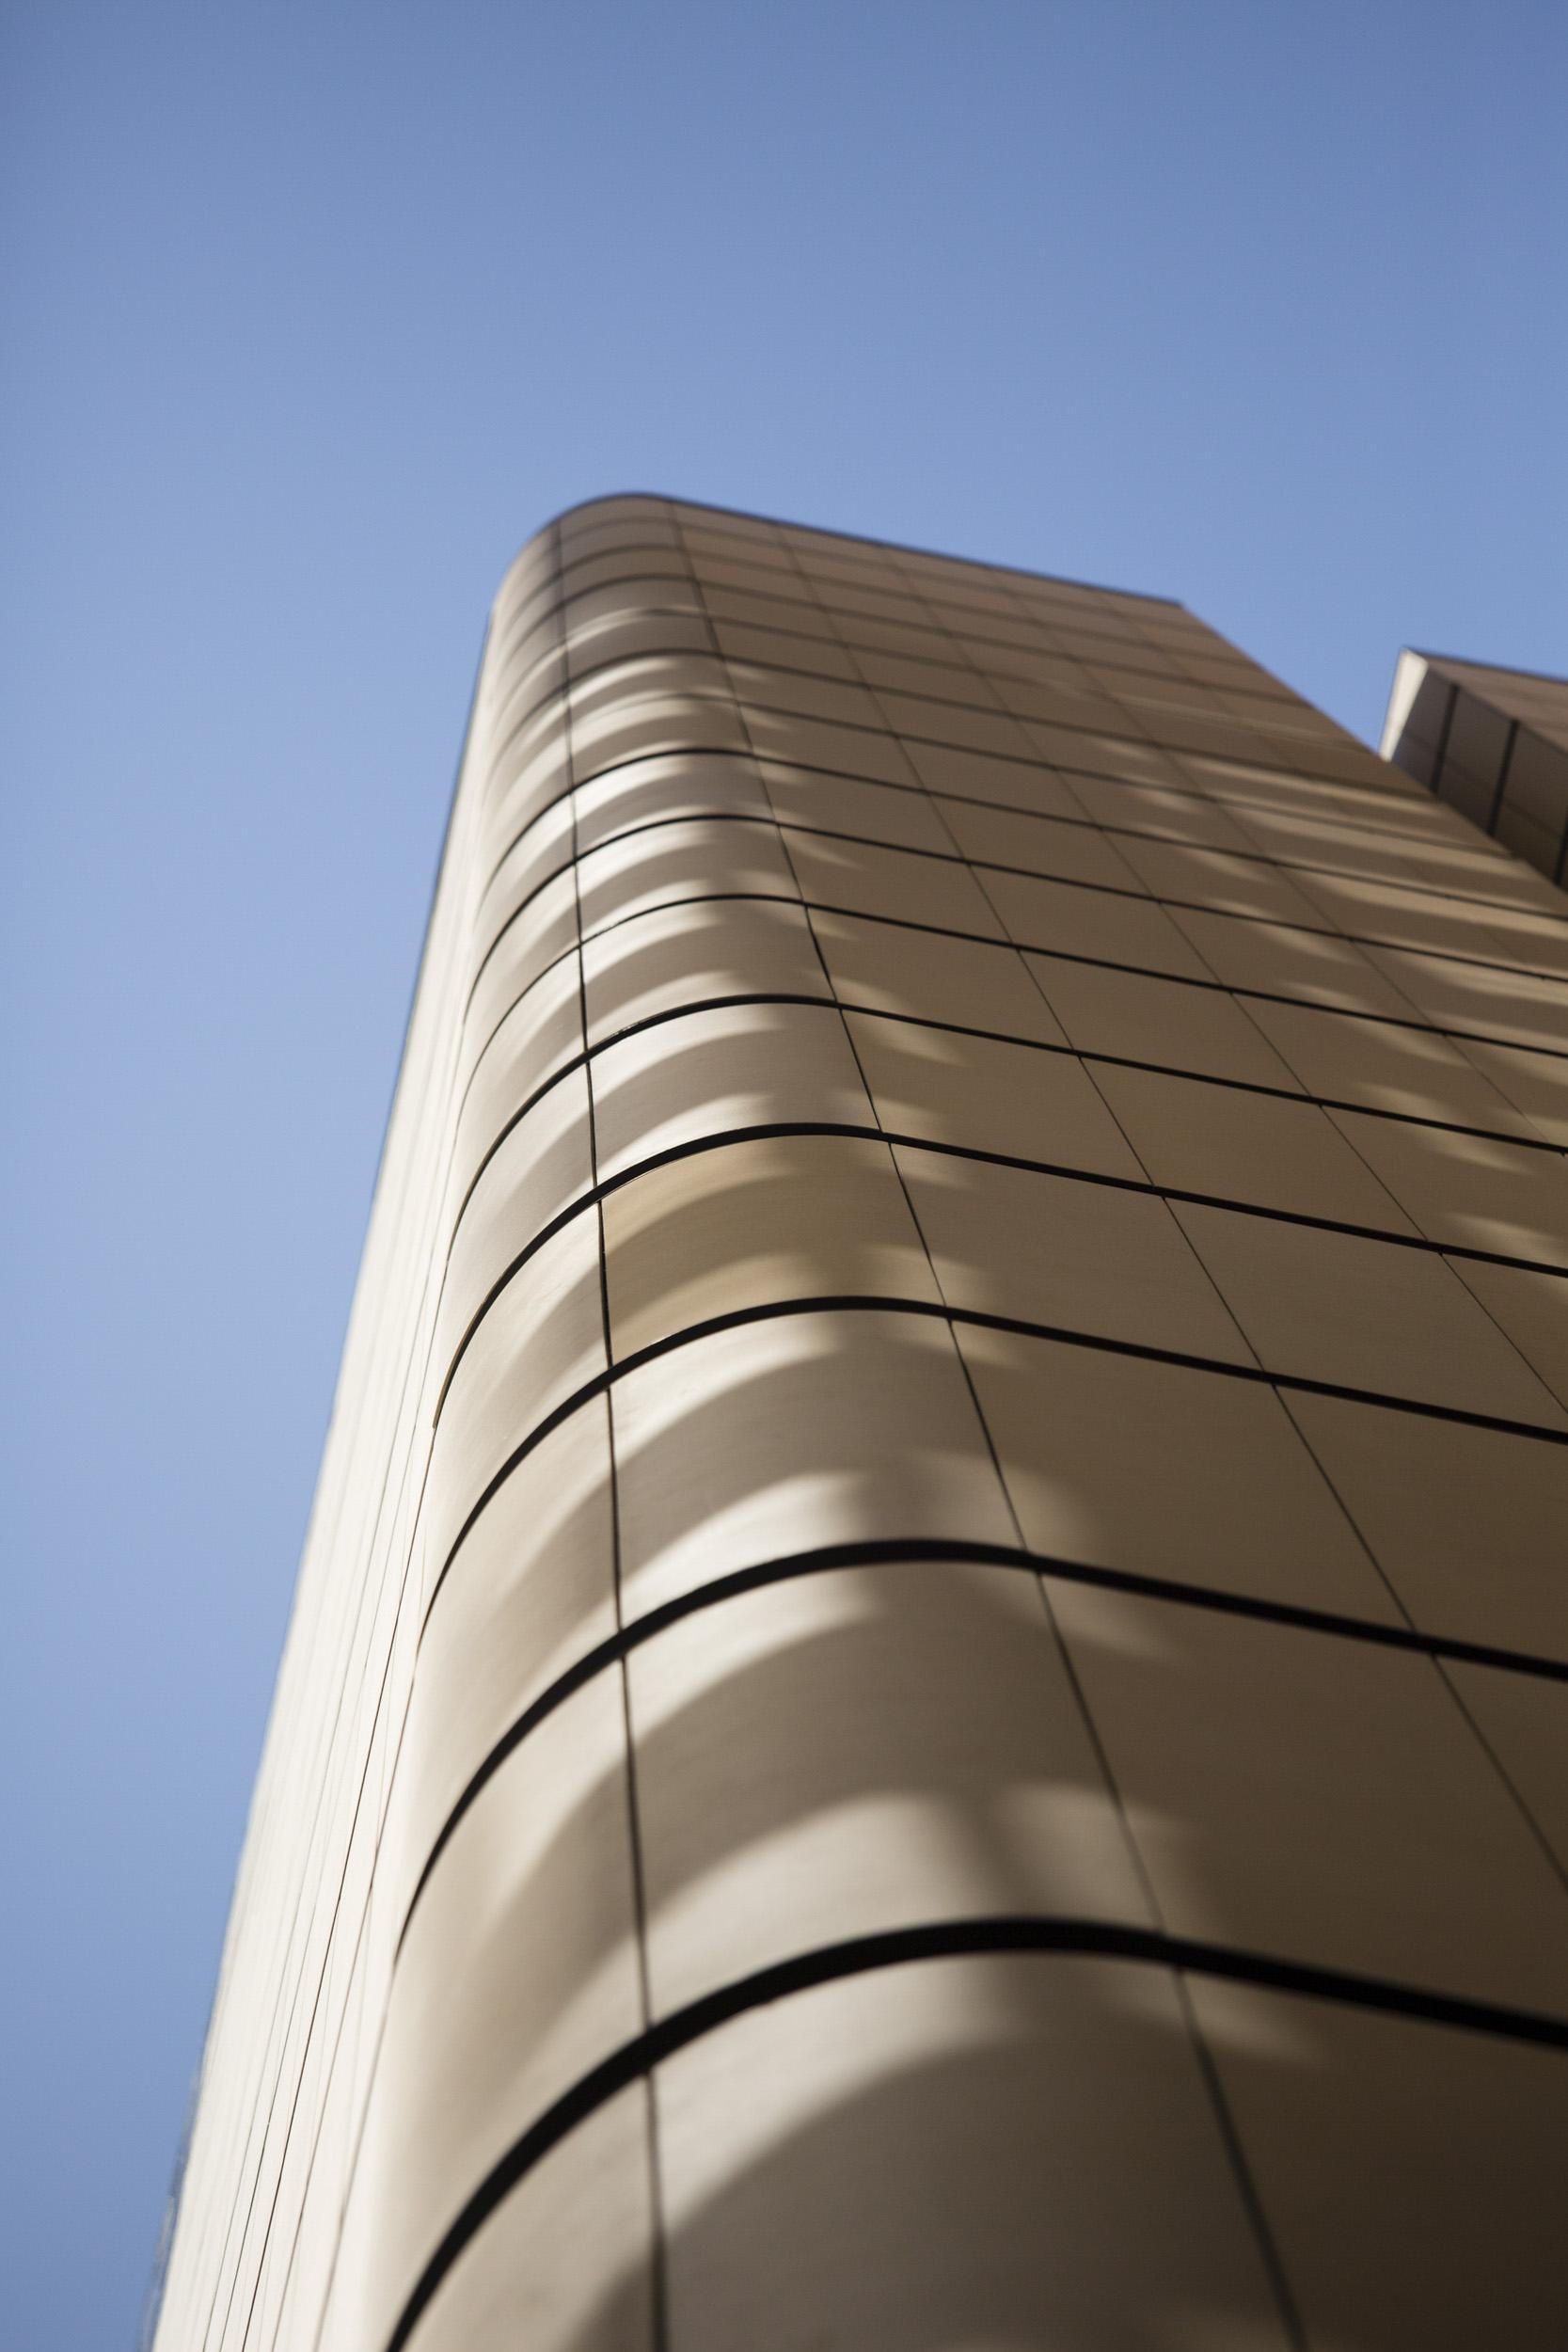 hirise_architecture_sydney_australia_26.jpg